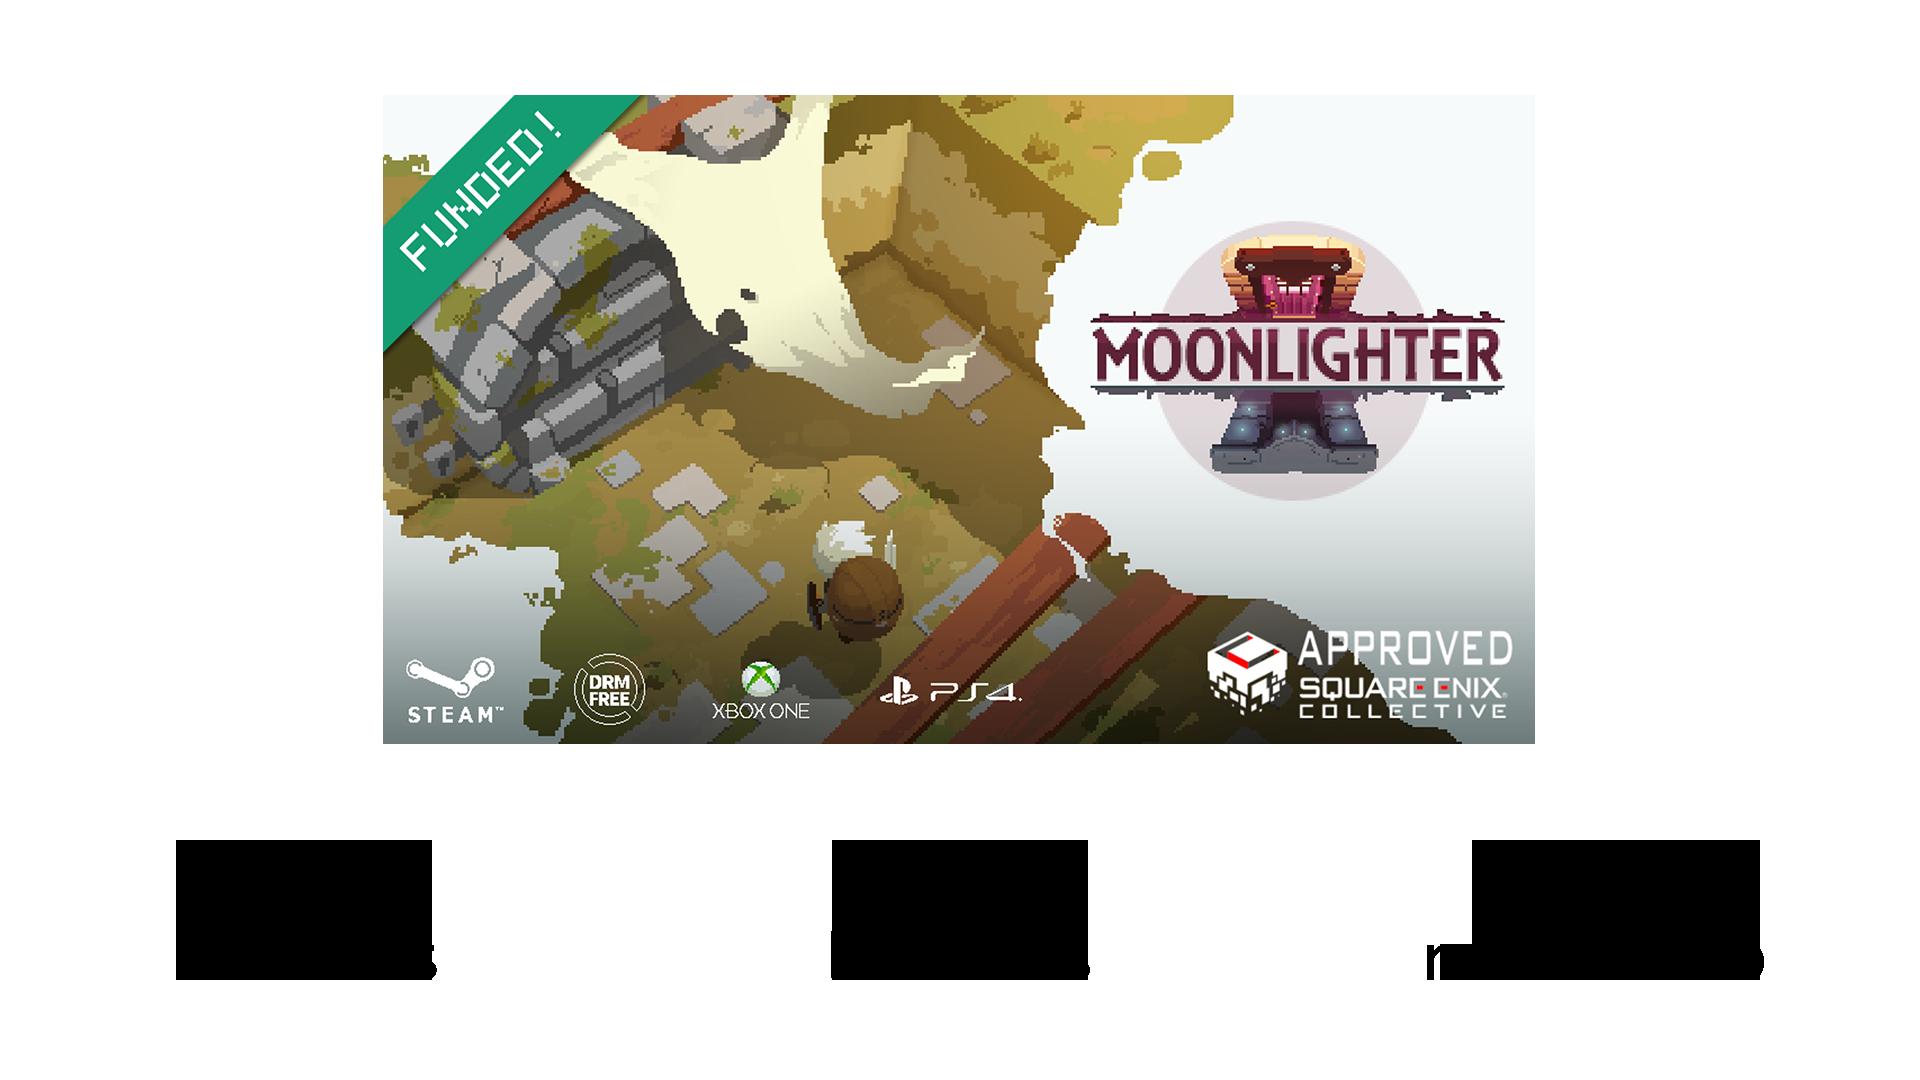 Moonlighter proyecto kickstarter espana SYBIC crowdfunding